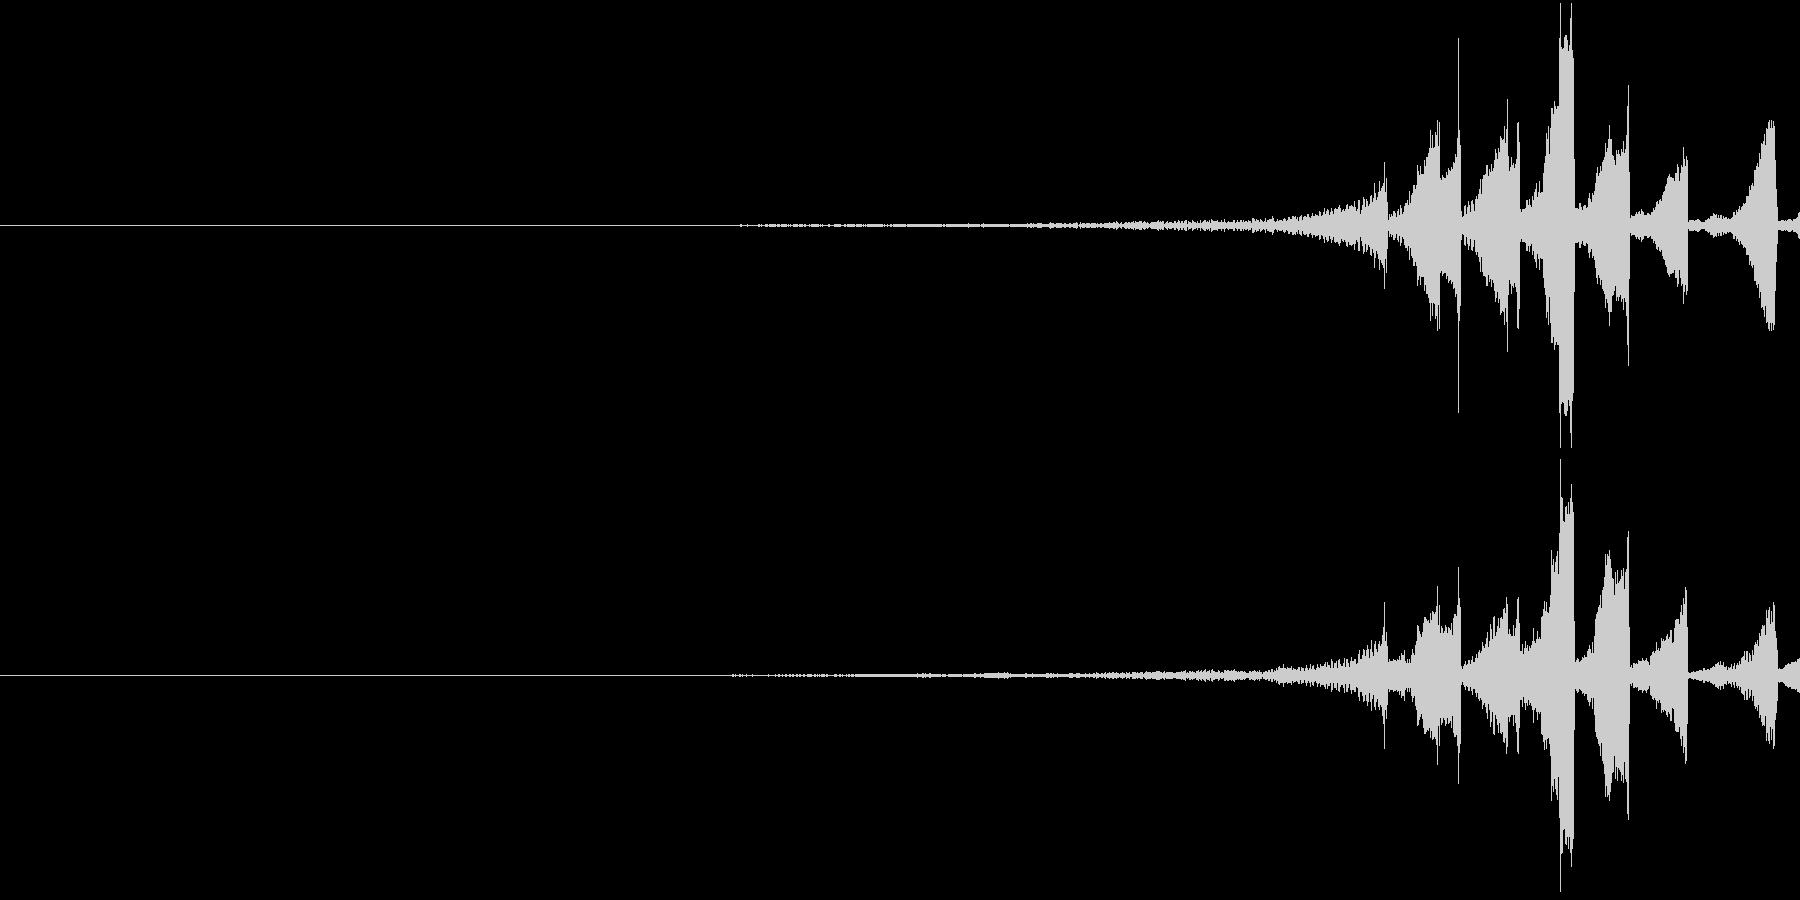 ZAP リバースサウンド 逆再生 戻るの未再生の波形